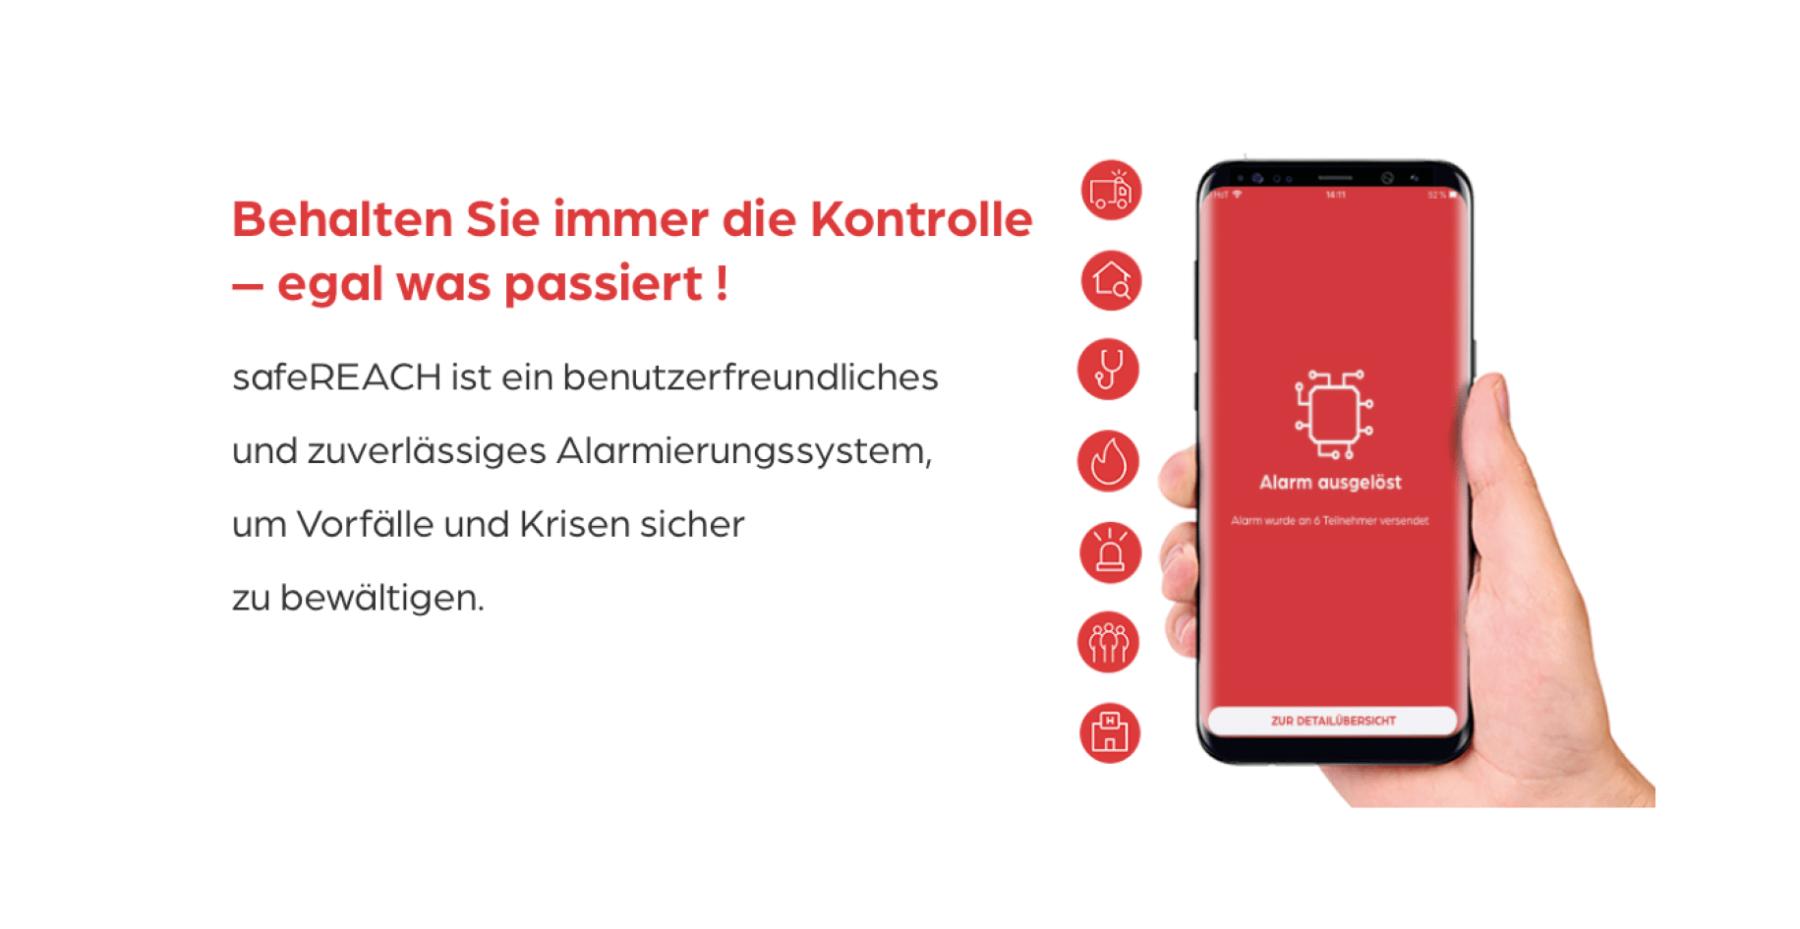 safereach App e1602591635161 - Kunde im Fokus - SAFEREACH